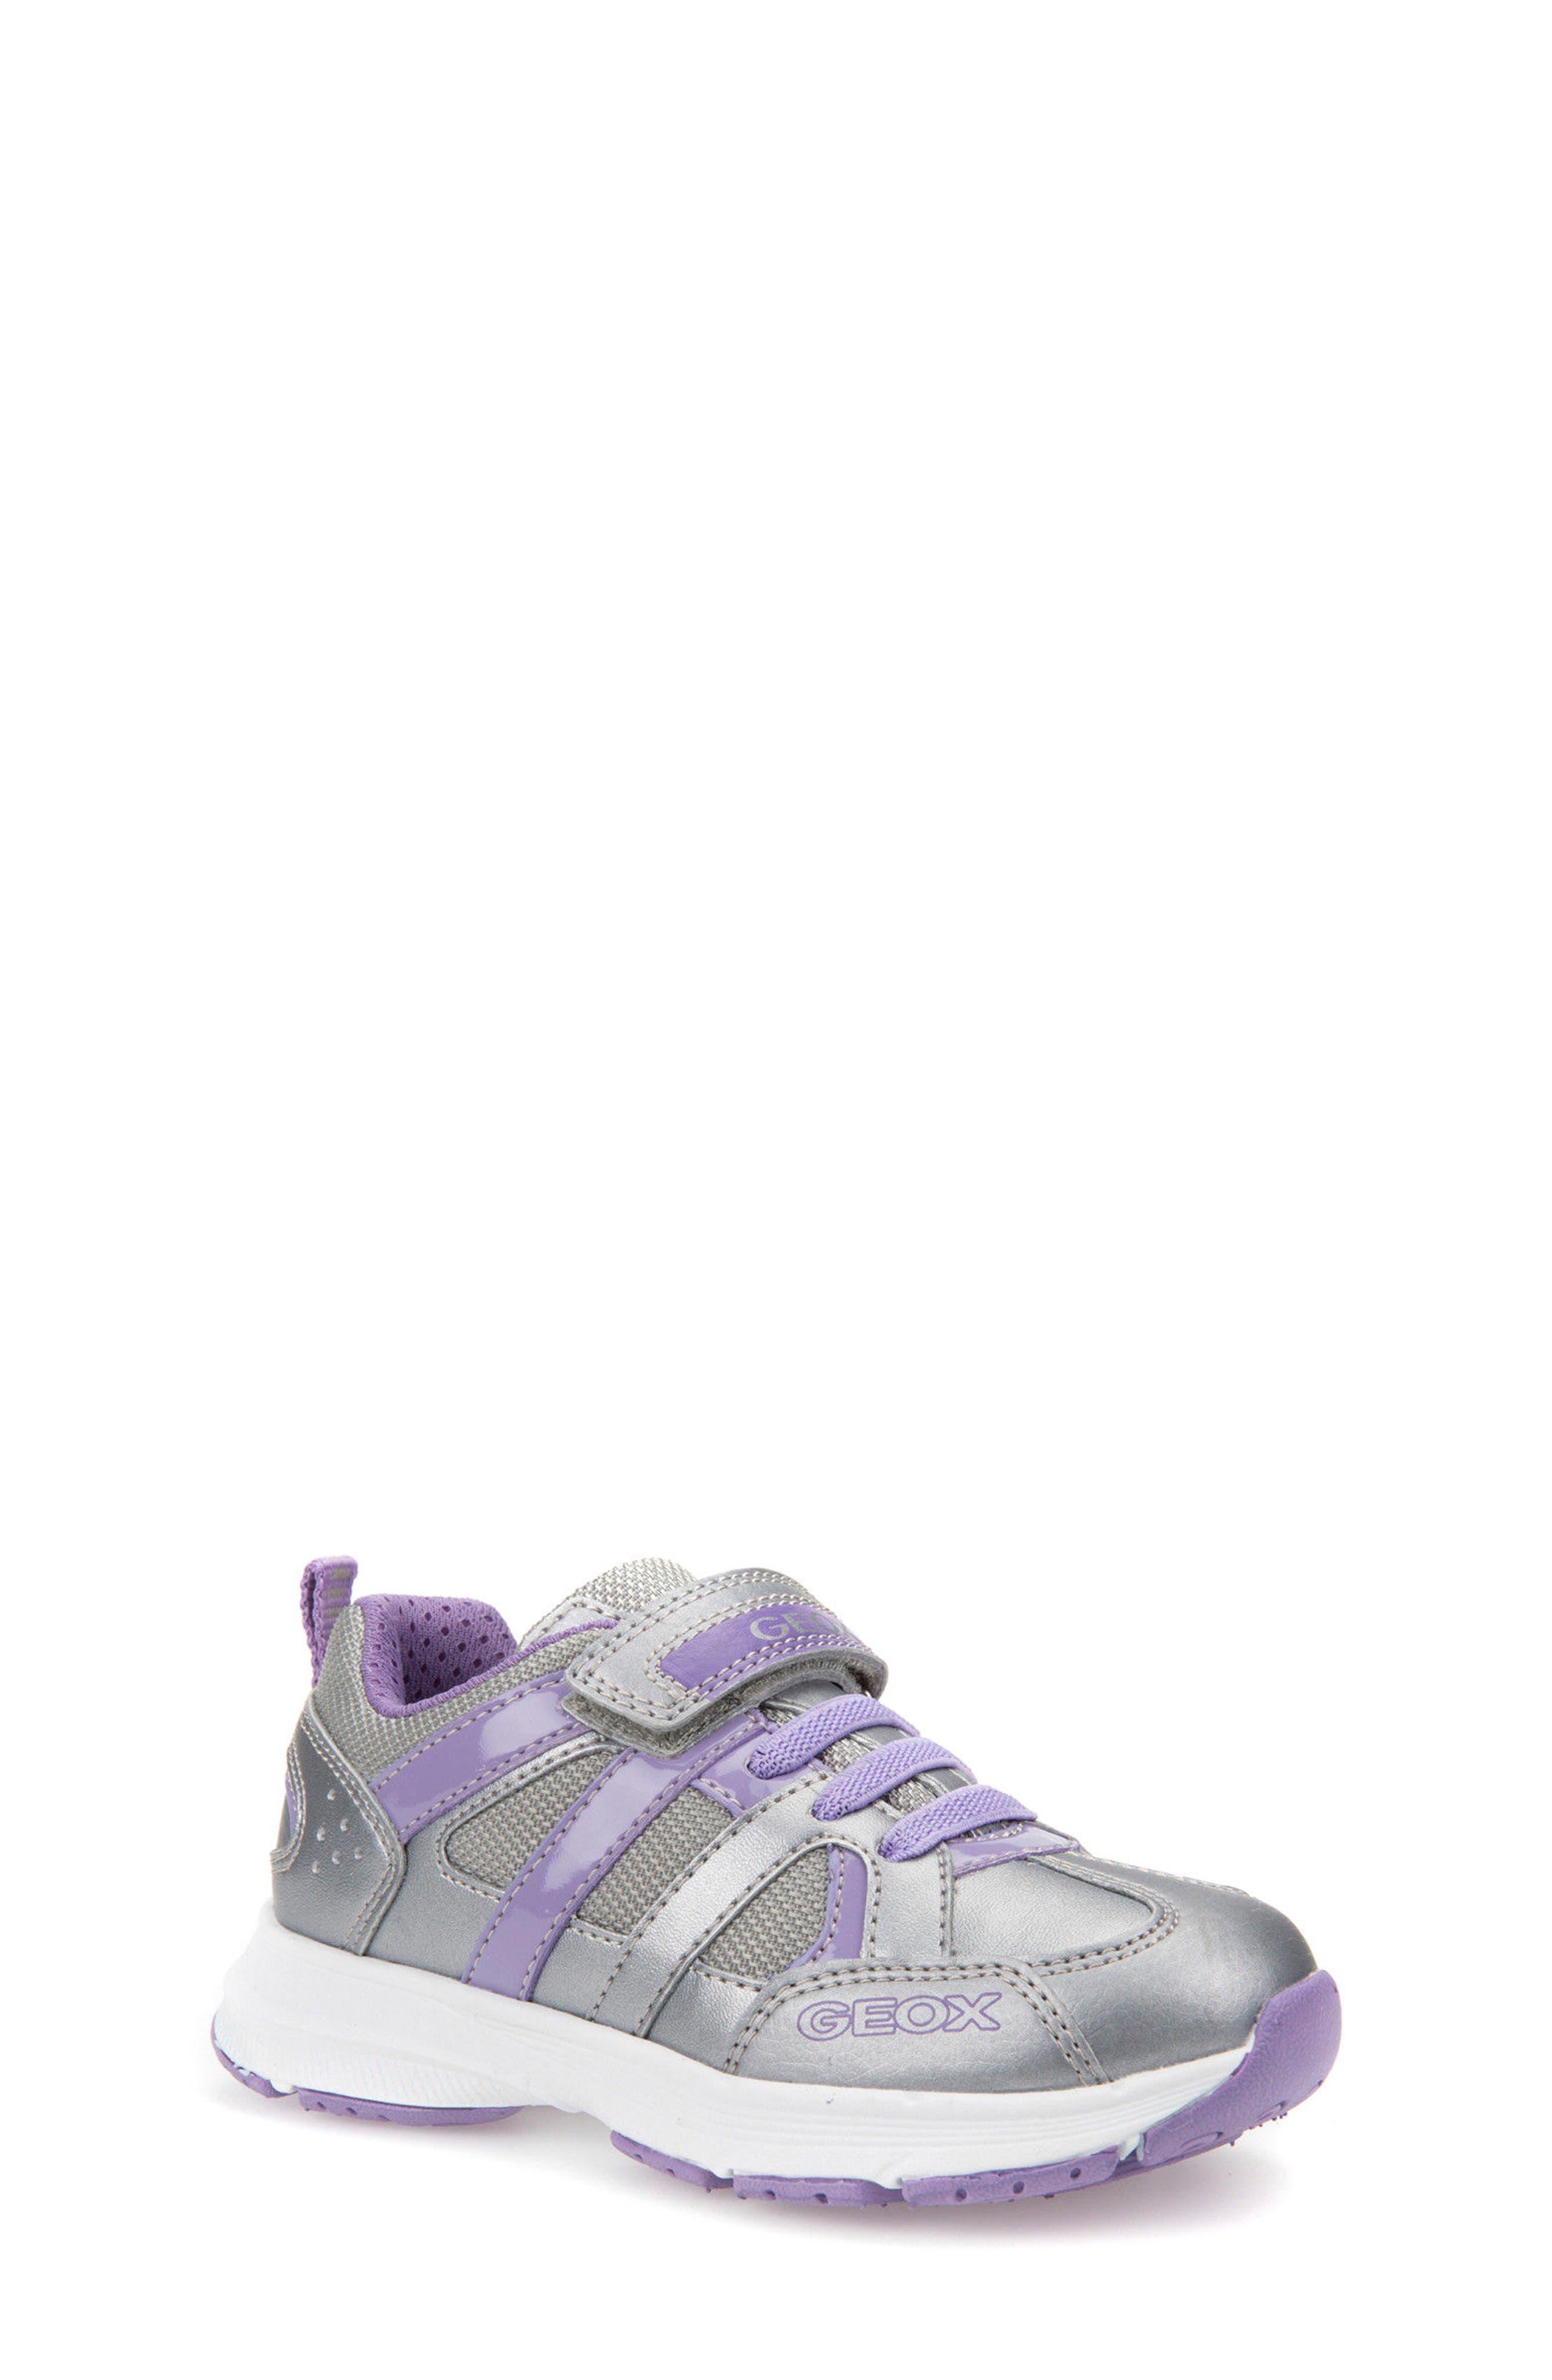 Geox Top Fly Sneaker (Toddler, Little Kid & Big Kid)